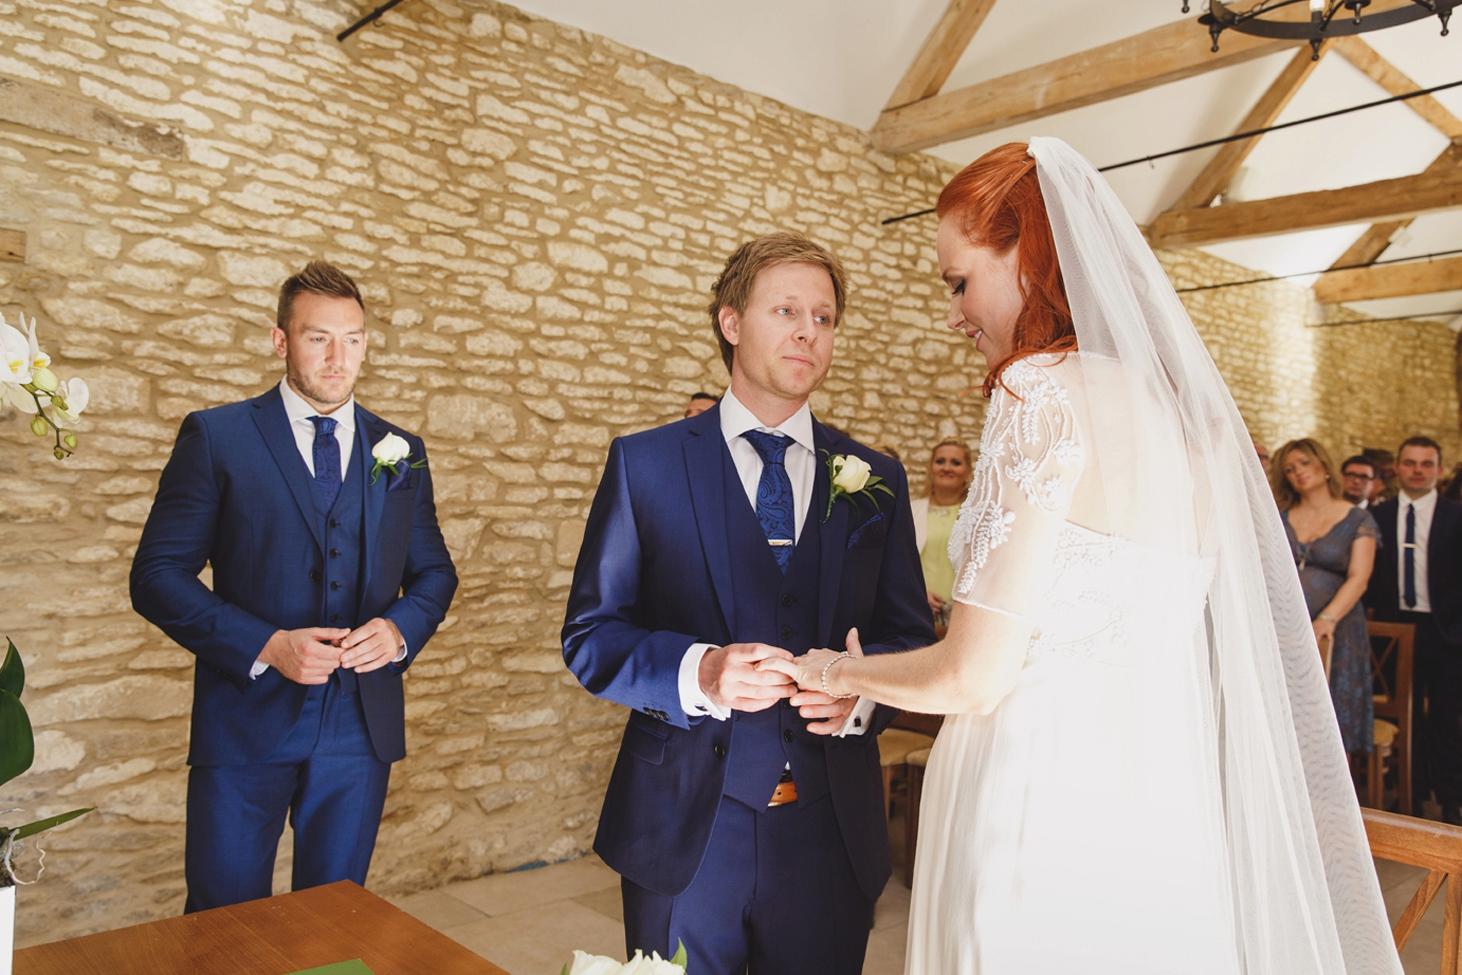 caswell house wedding photography wedding ceremony